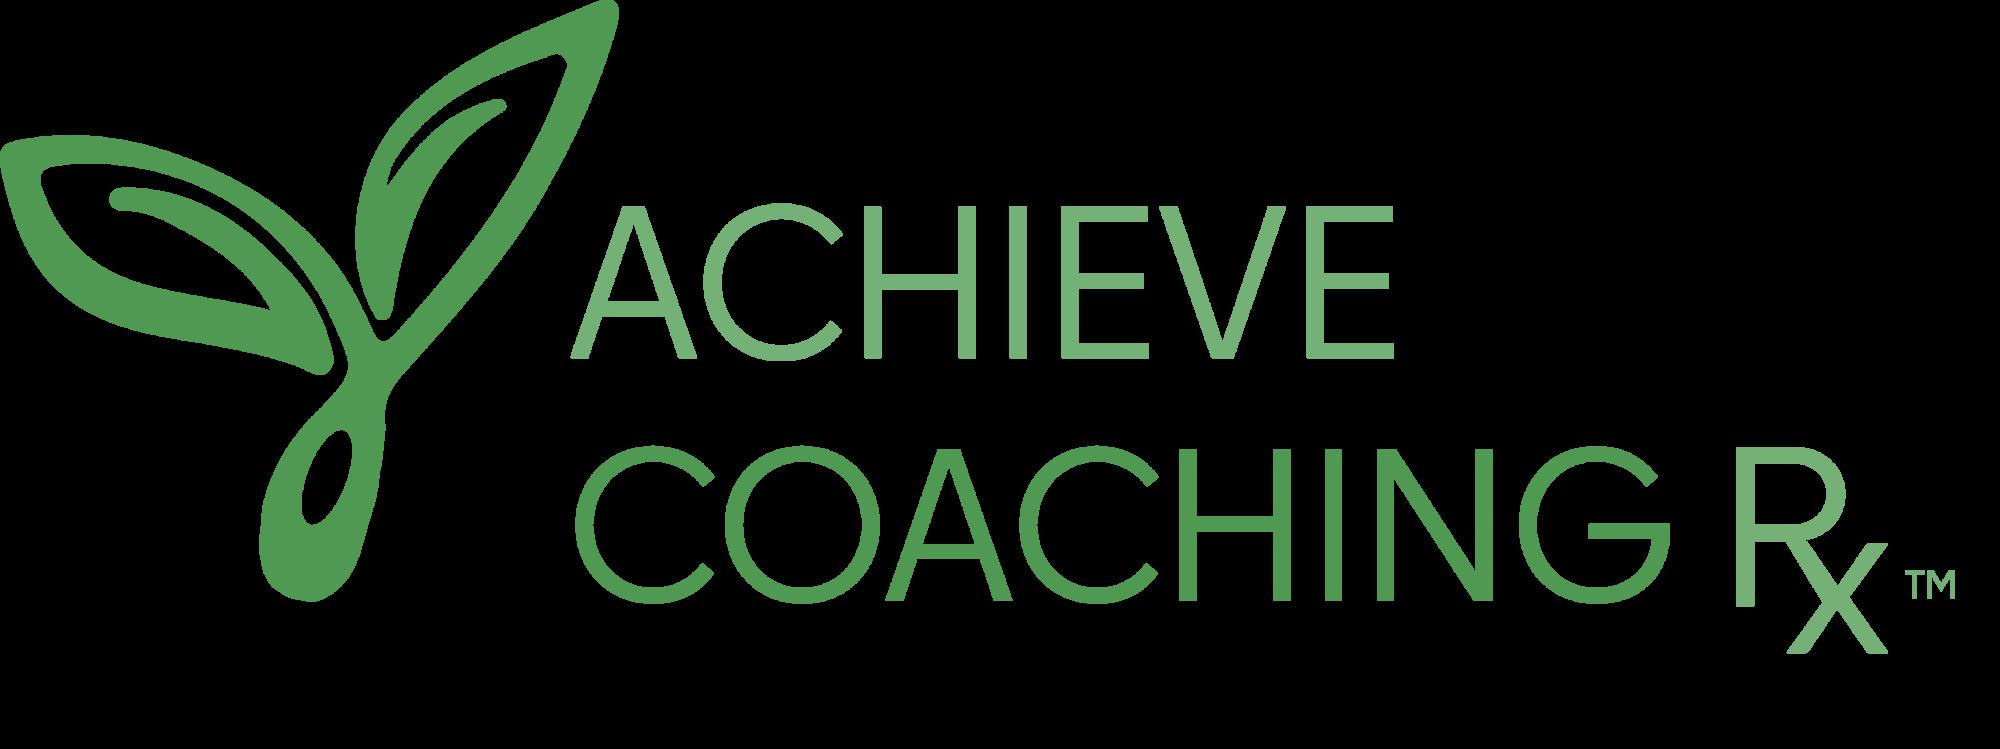 Achieve Coaching Rx